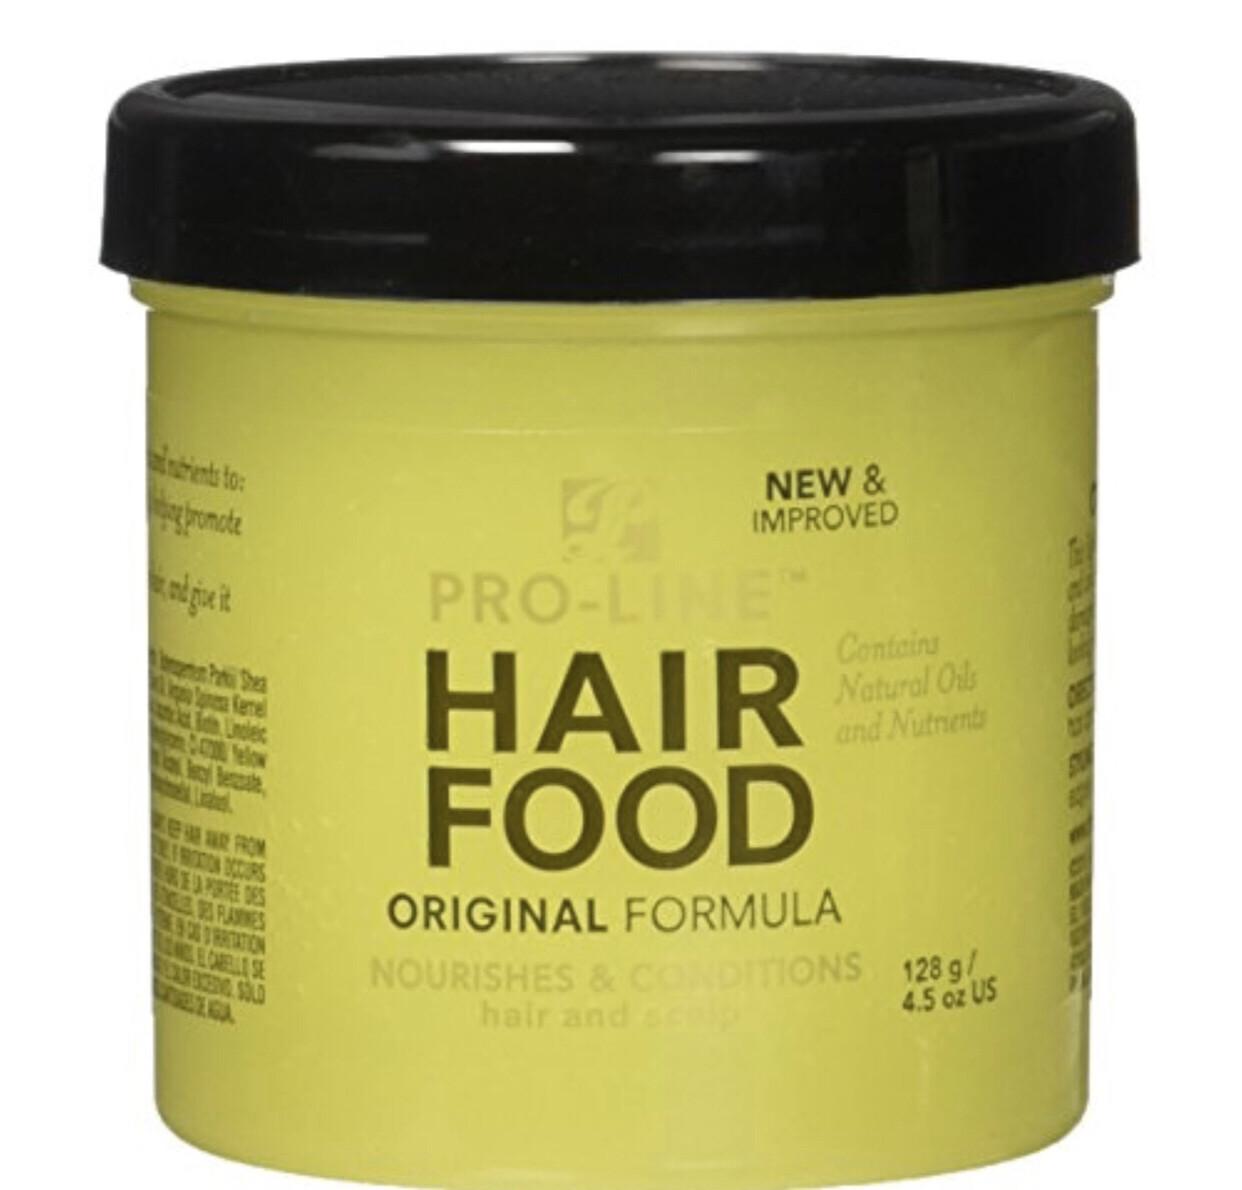 Pro-line Hair Food 4.5oz